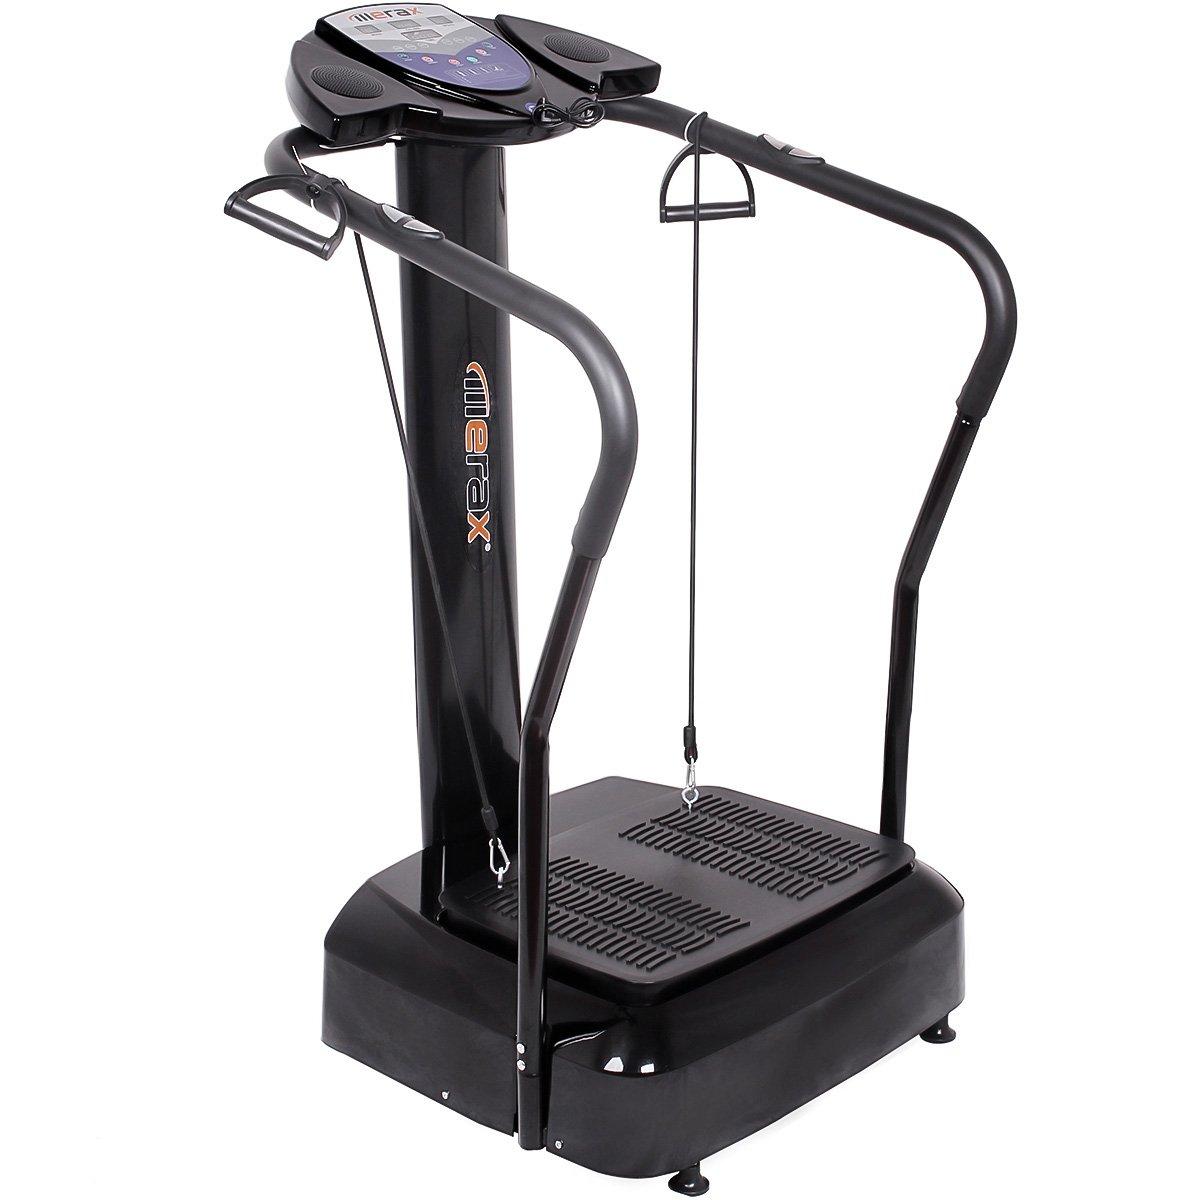 Merax Whole Body Vibration Platform Machine 2000w